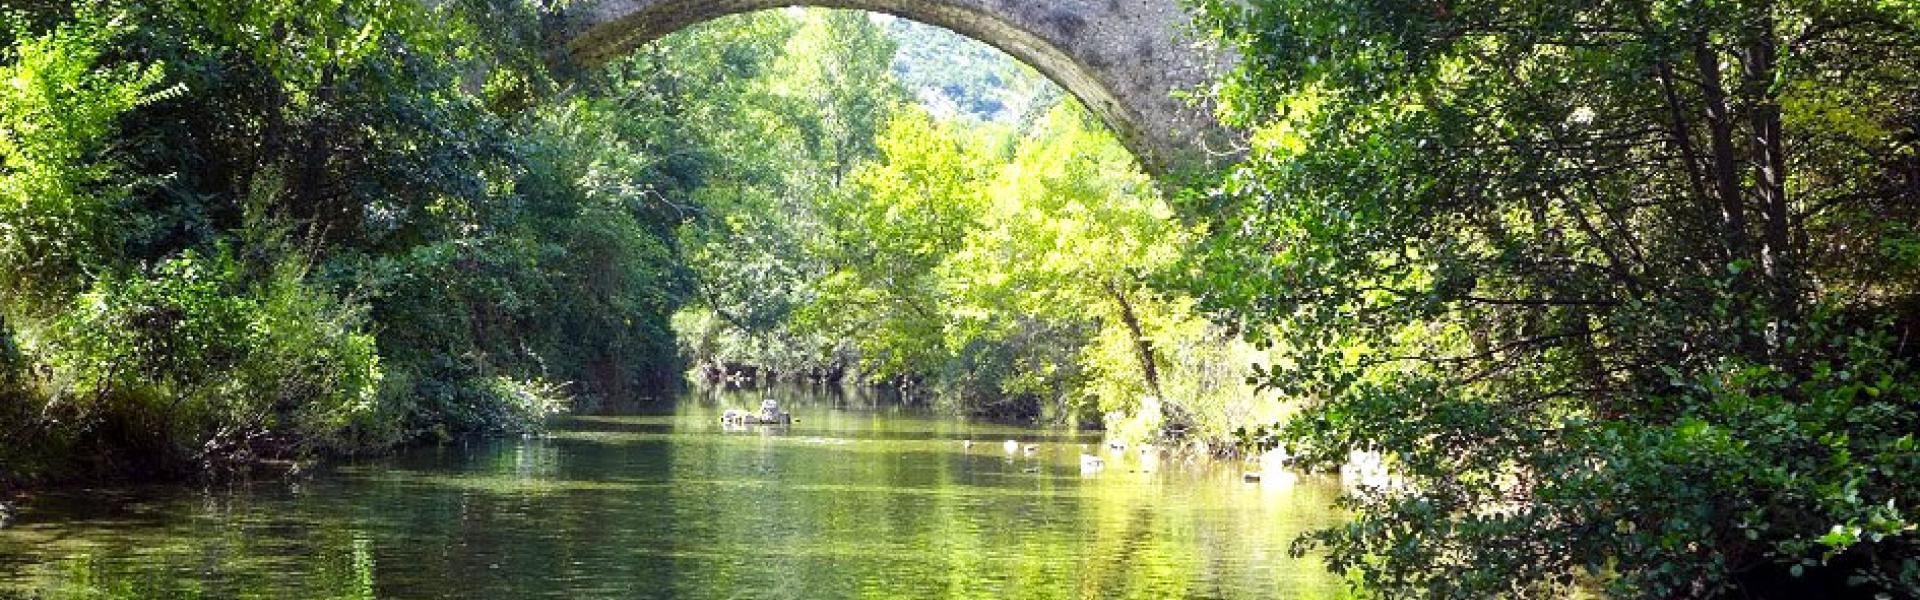 Pont Moutonier ©SMGSNav